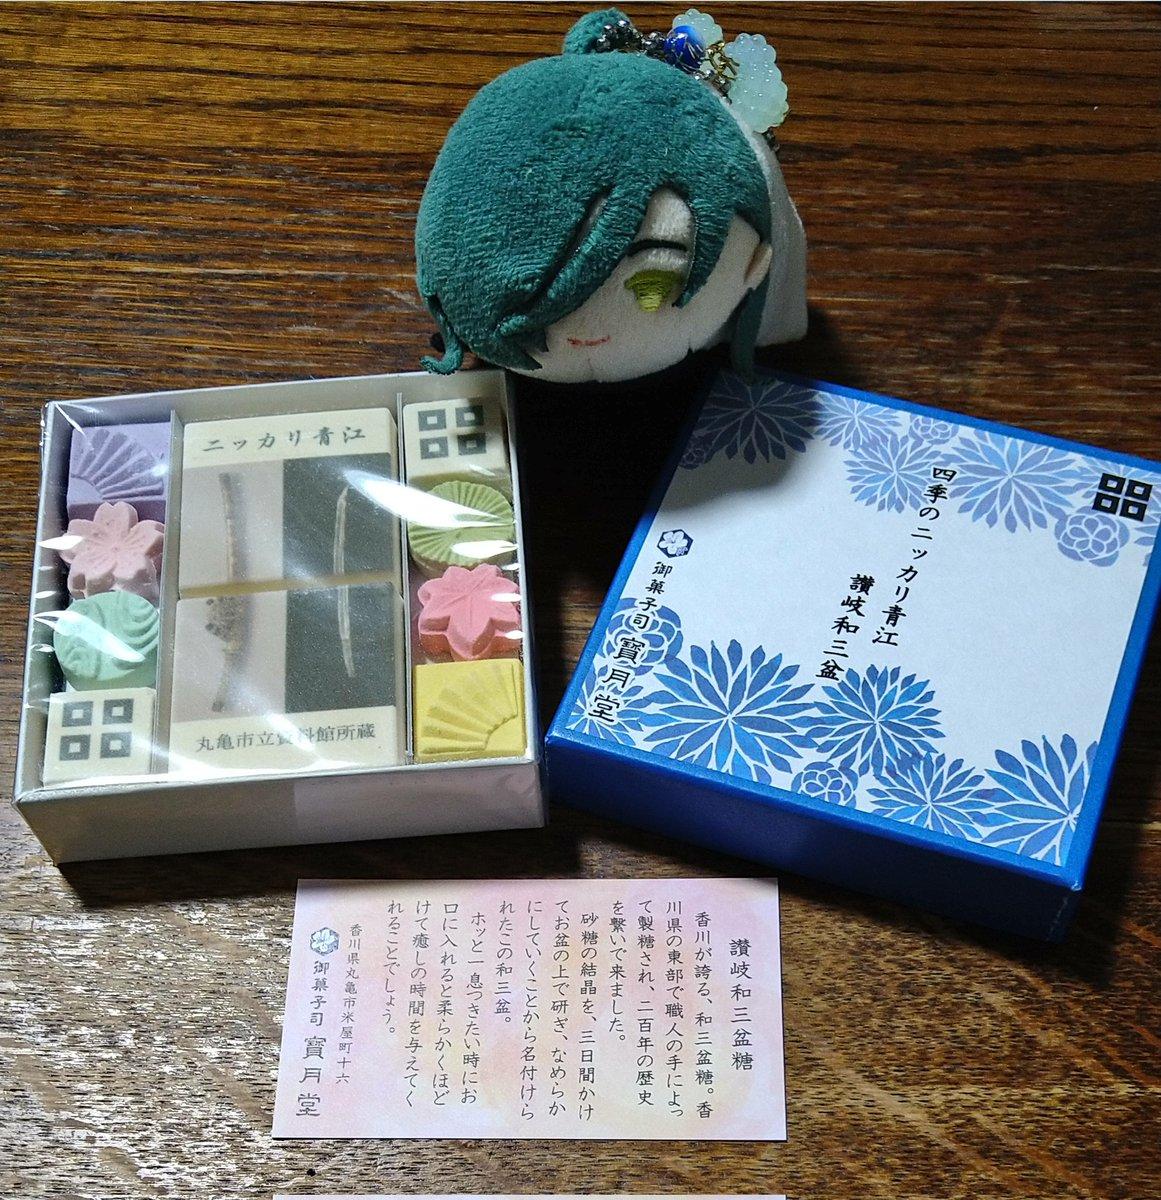 test ツイッターメディア - ニッカリ青江さんの和三盆食べます https://t.co/raCxvysmxJ